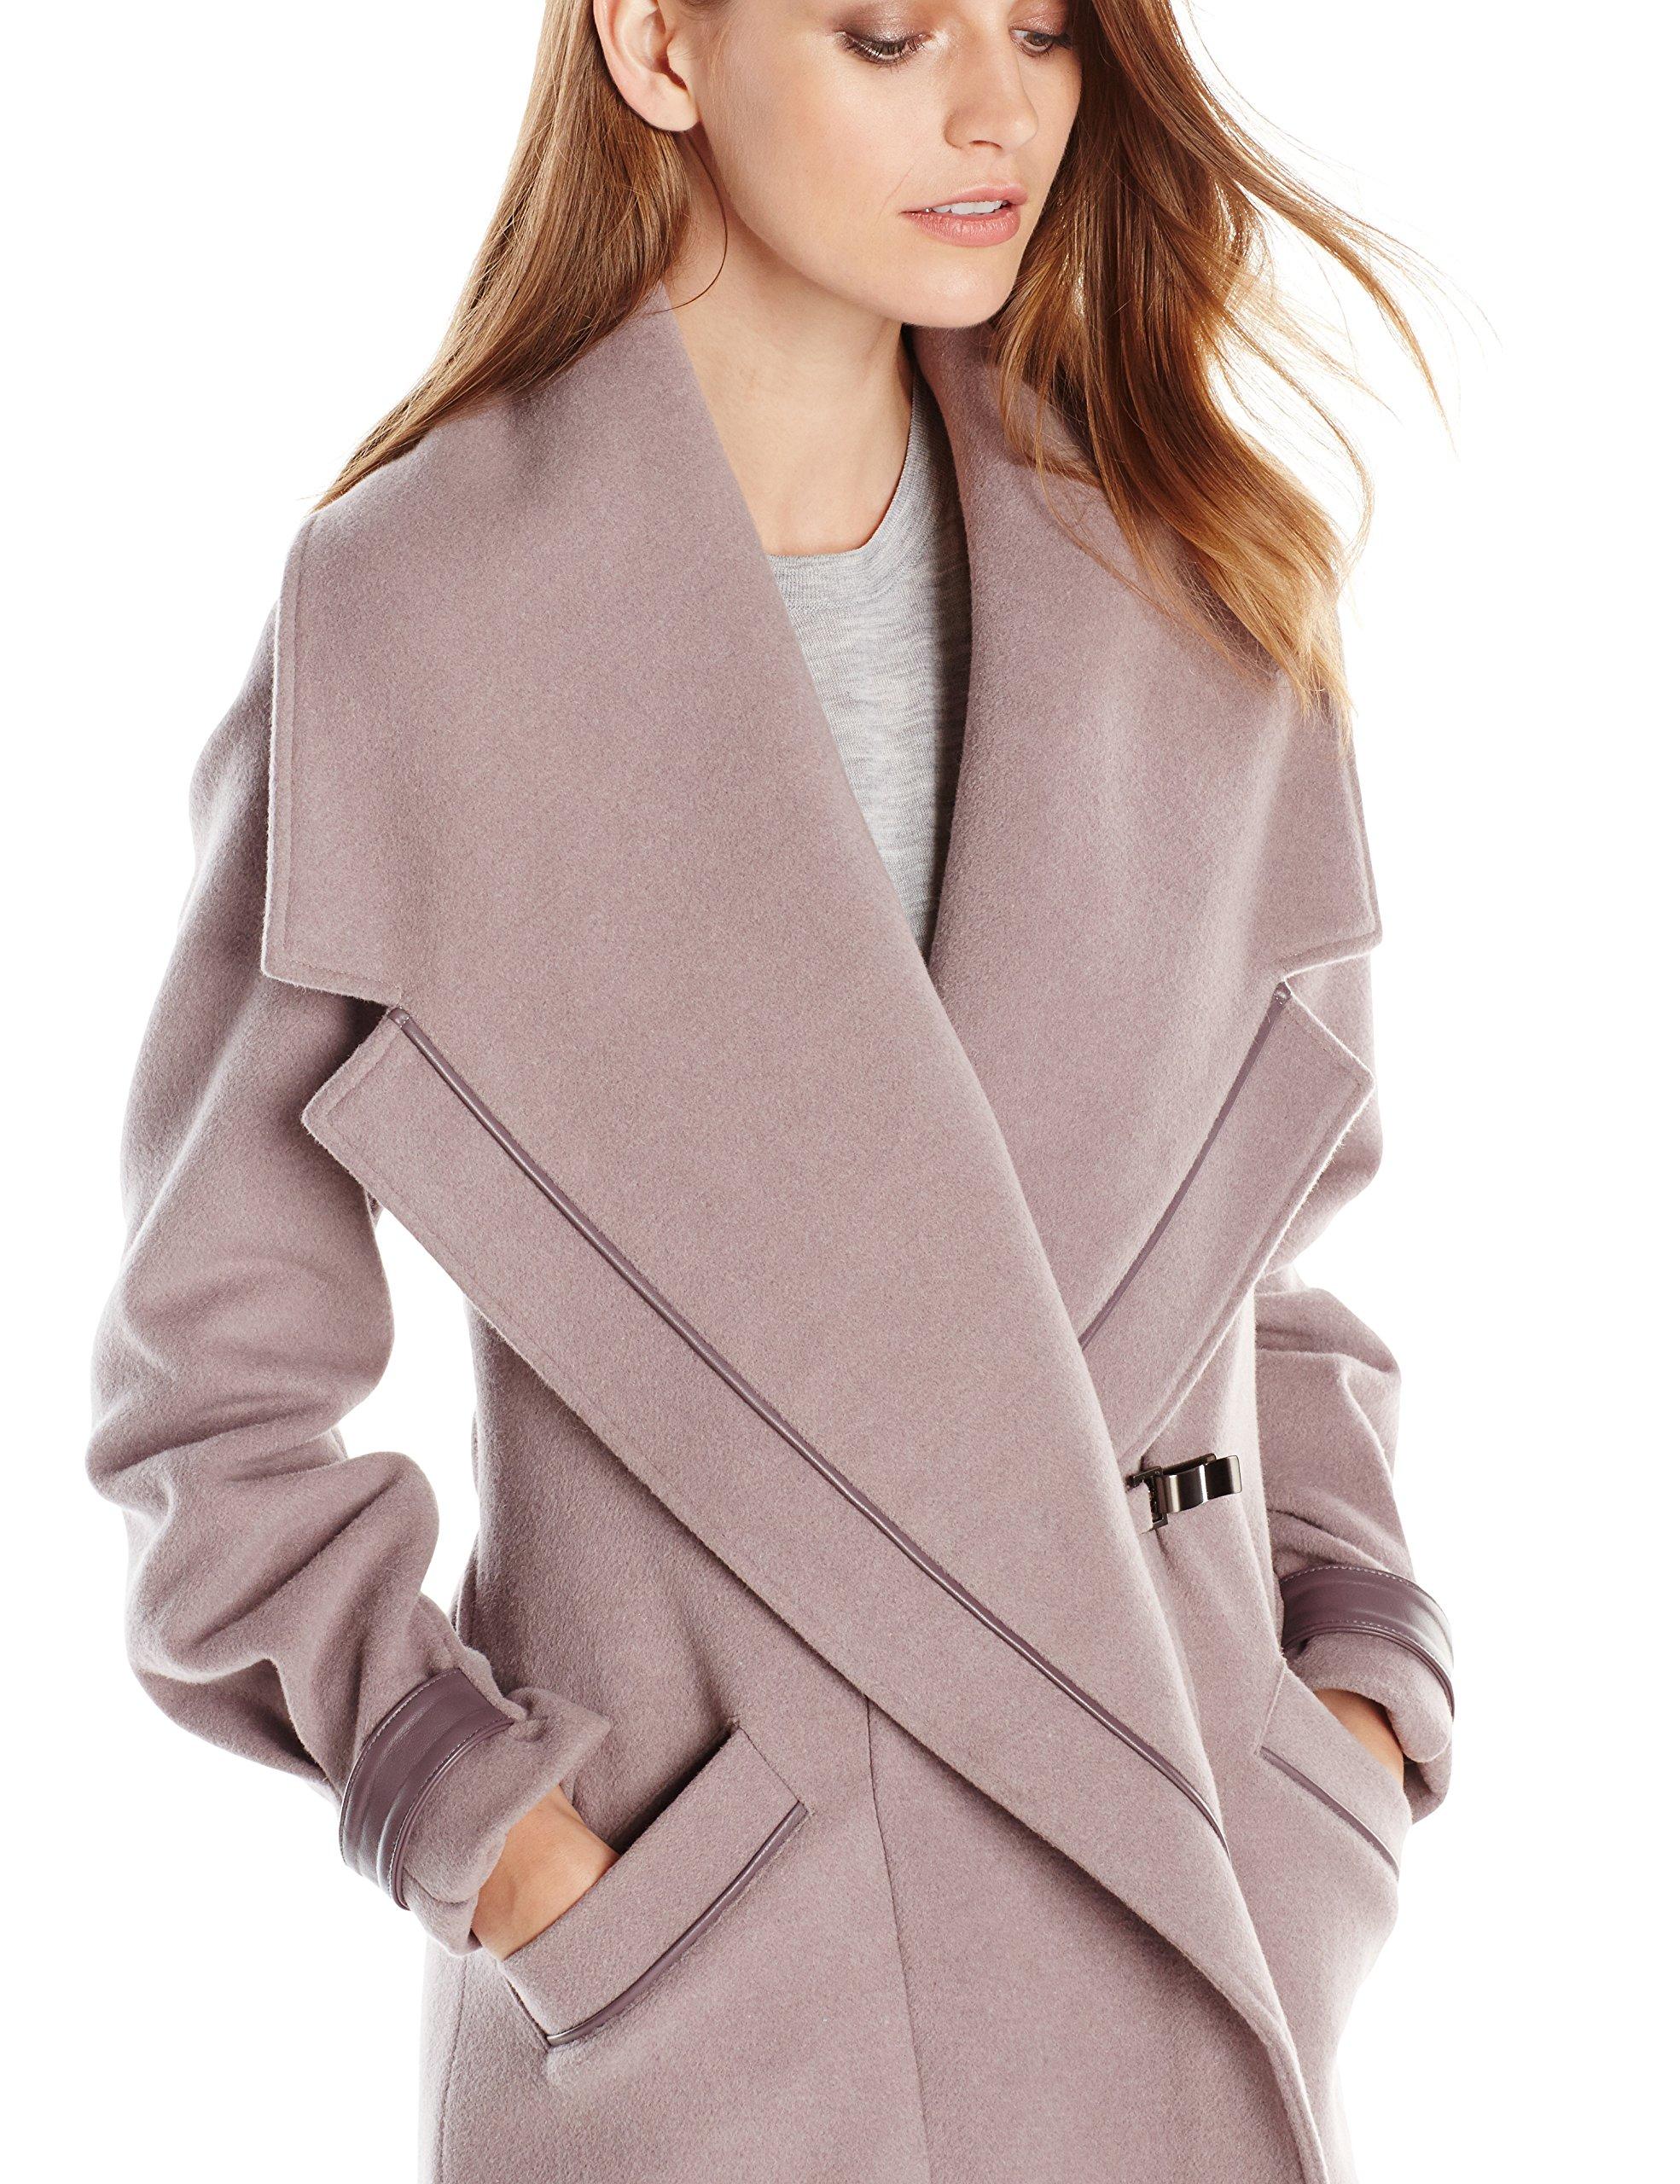 Badgley Mischka Women's Manila Wool-Blend Coat with Leather Trim